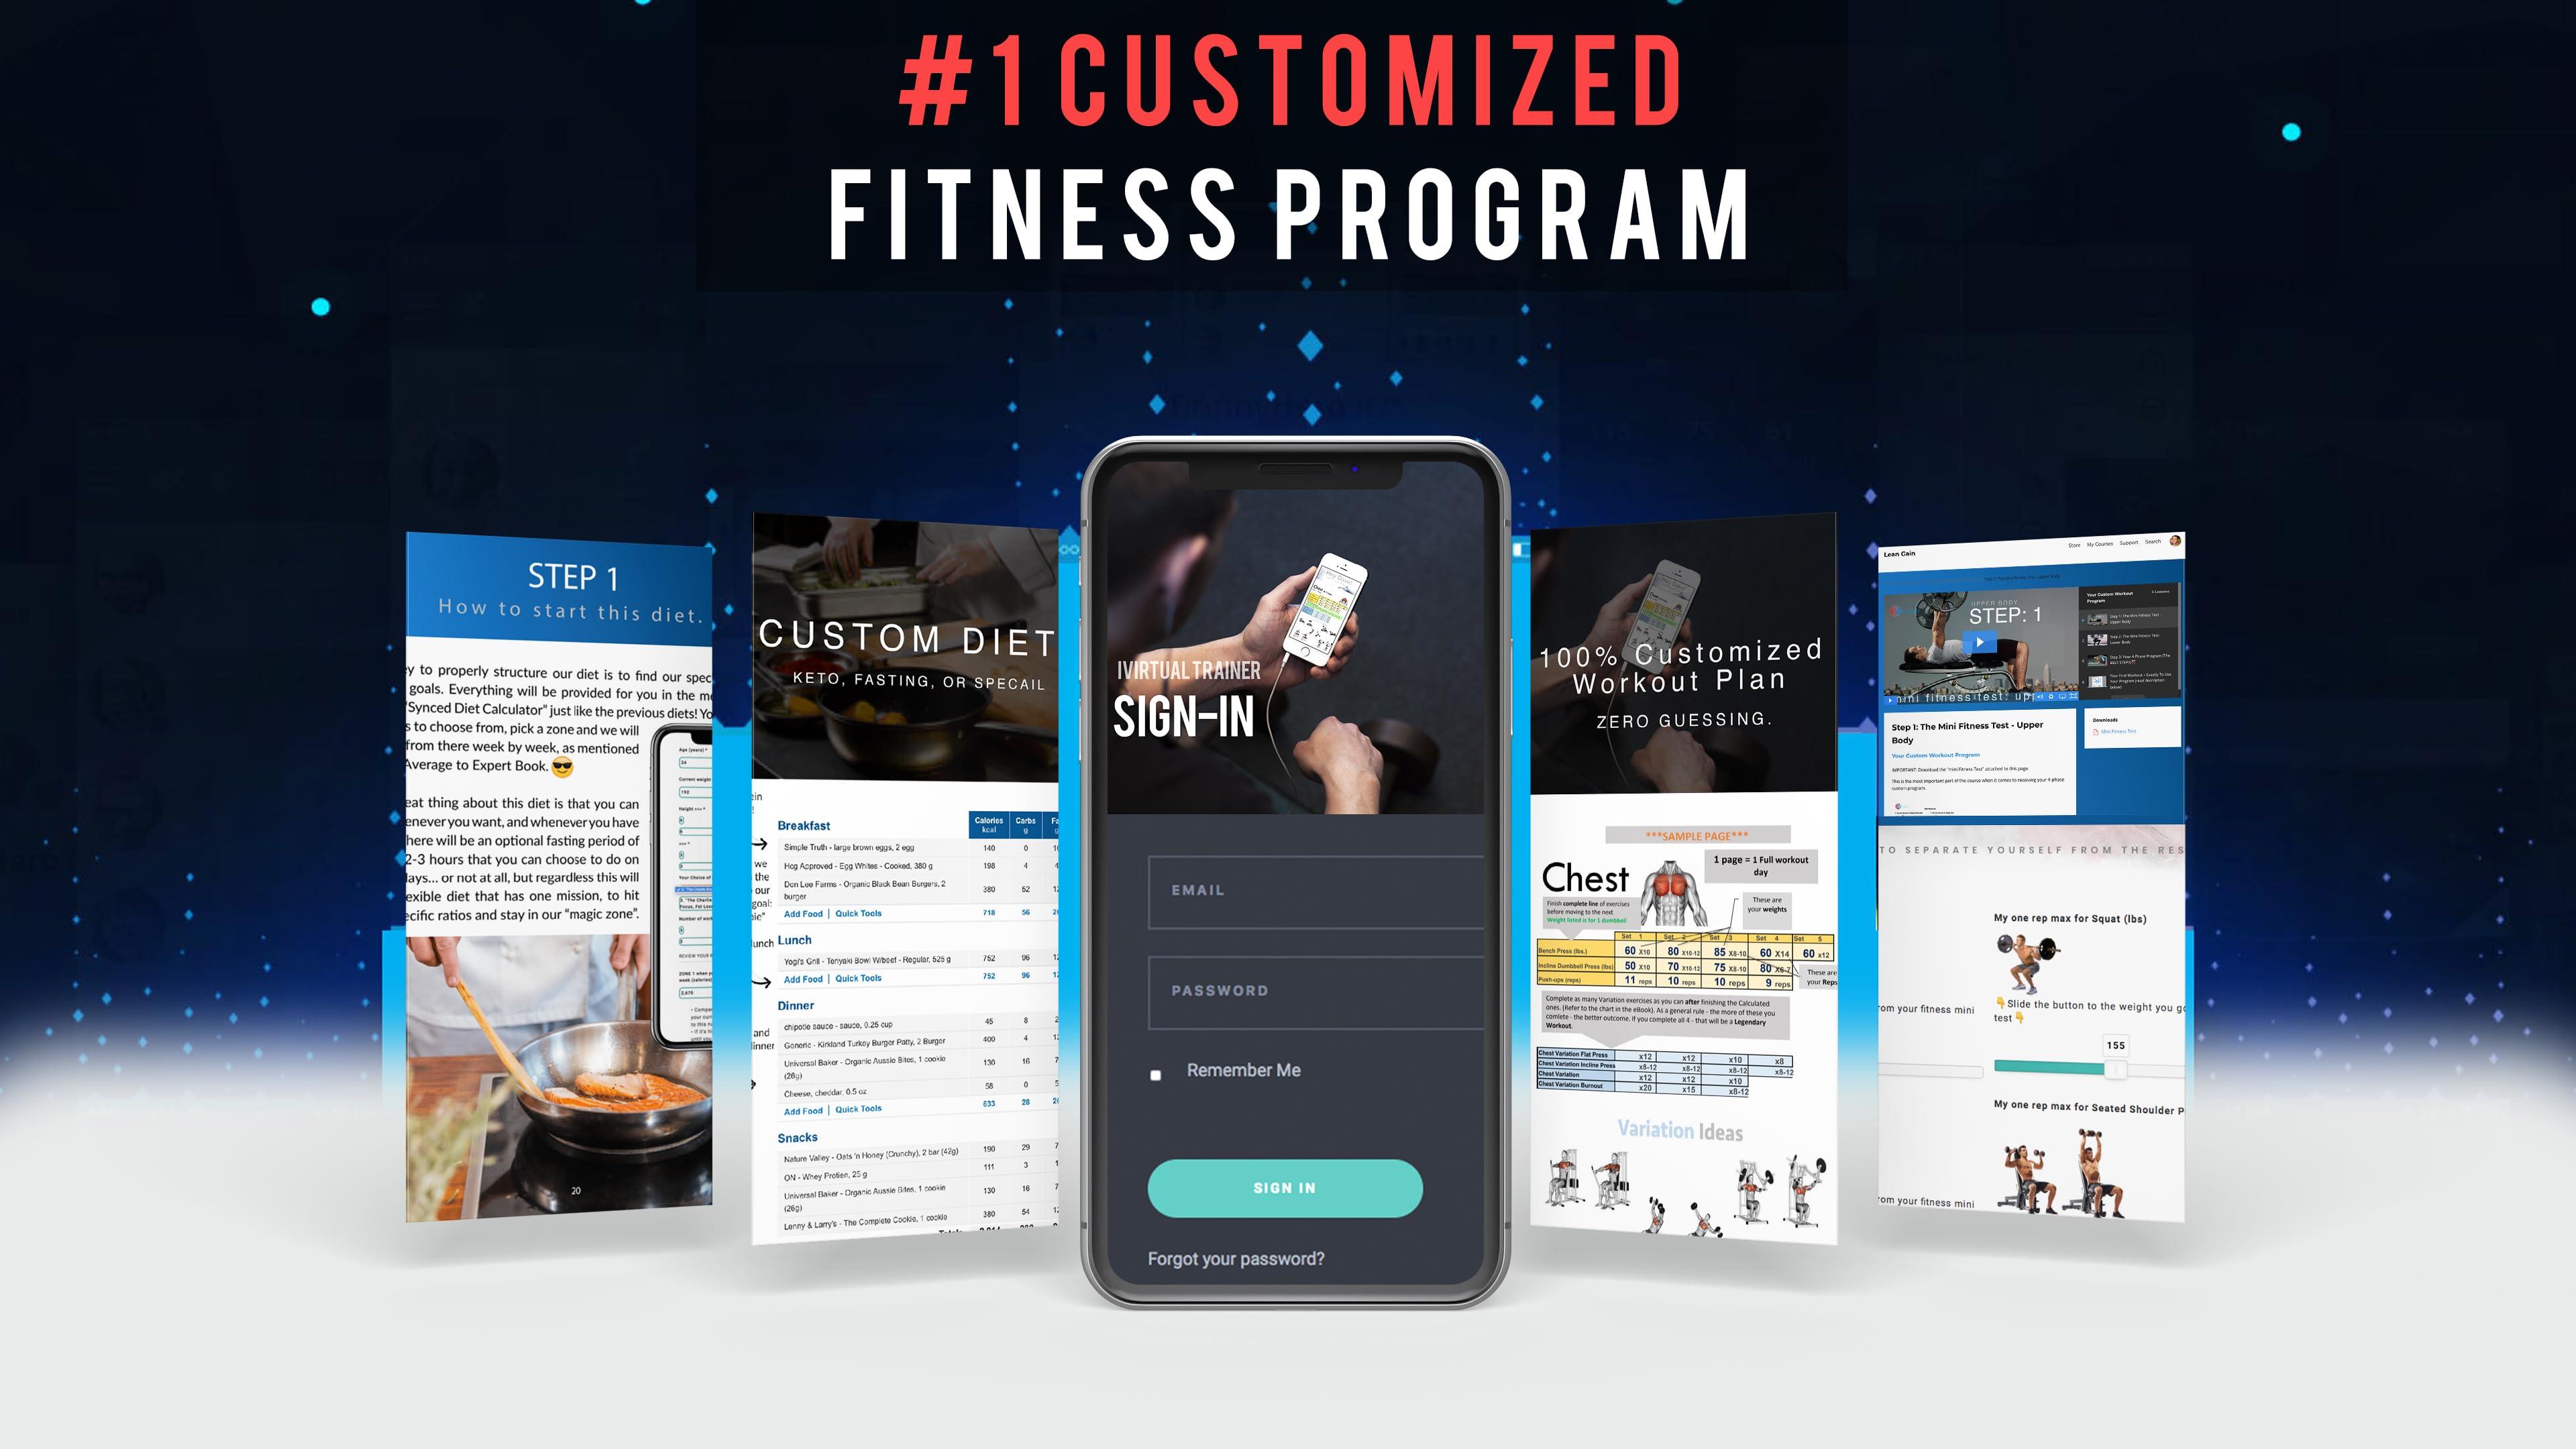 #1 Personalized Workout Program - Fat 100% Customized Quantity Regular dealer limited Loss Progr